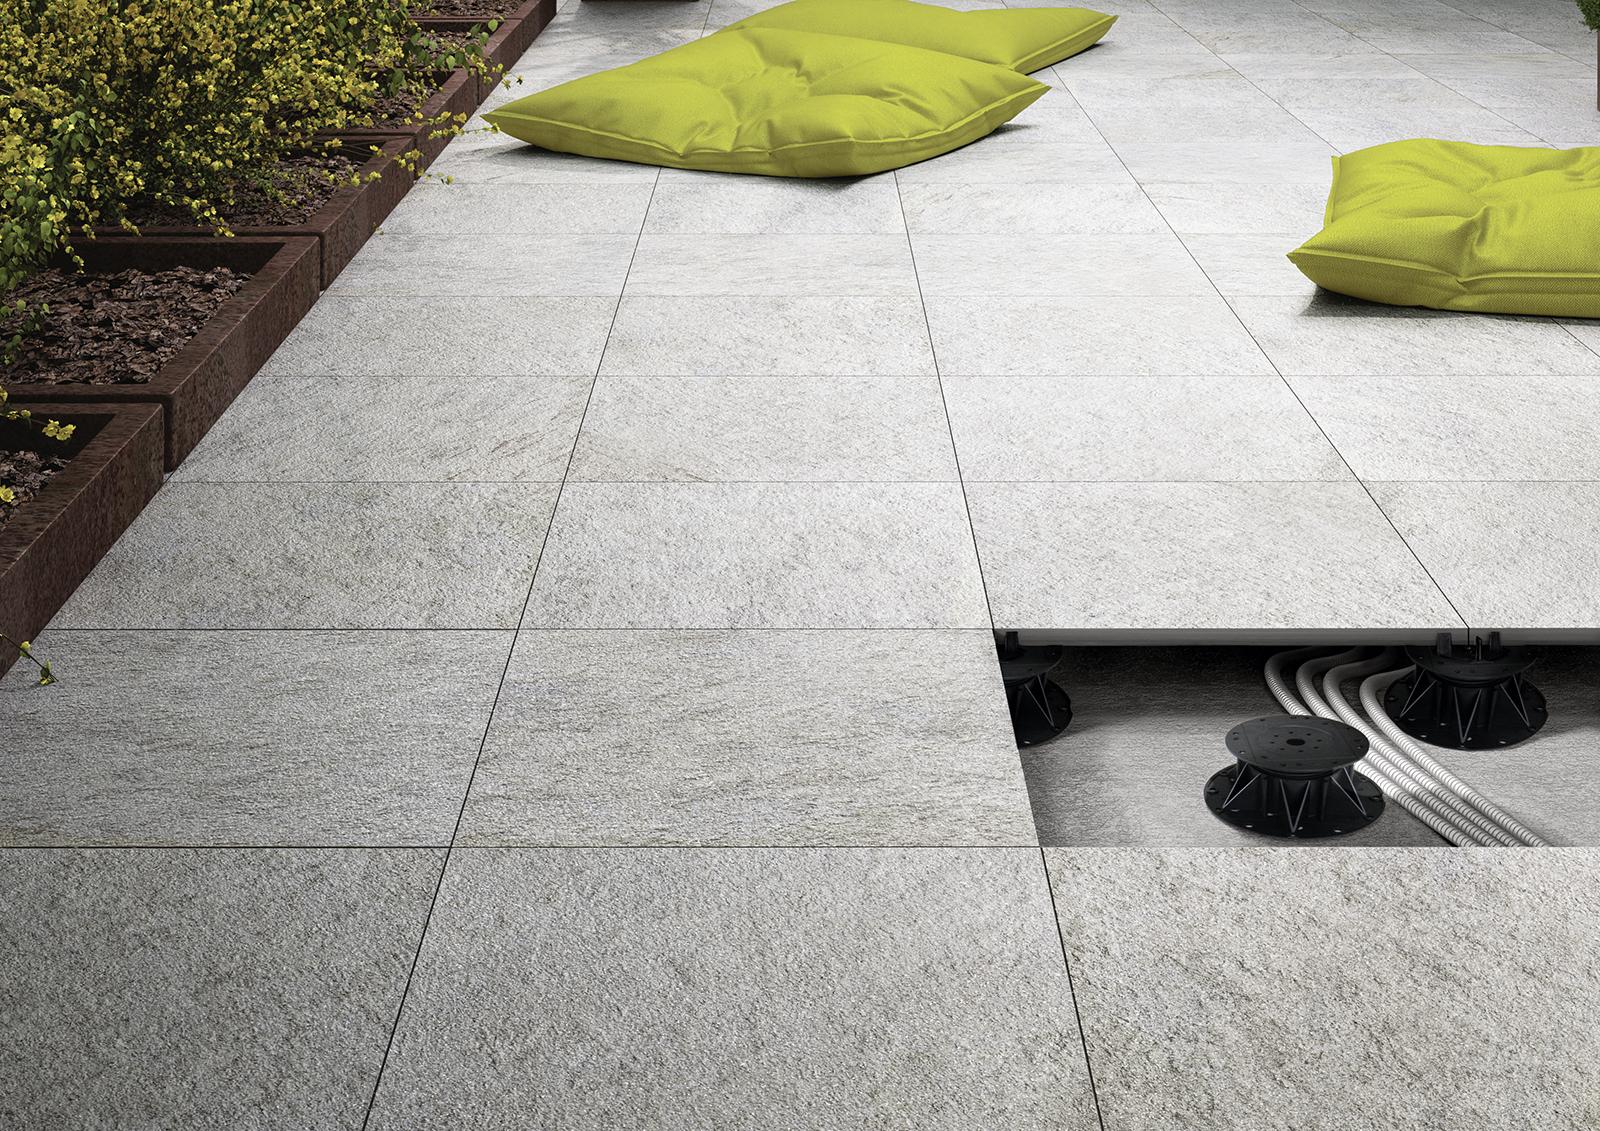 Multiquartz20 thick outdoor porcelain stoneware marazzi multiquartz20 ceramic tiles marazzi5502 doublecrazyfo Choice Image